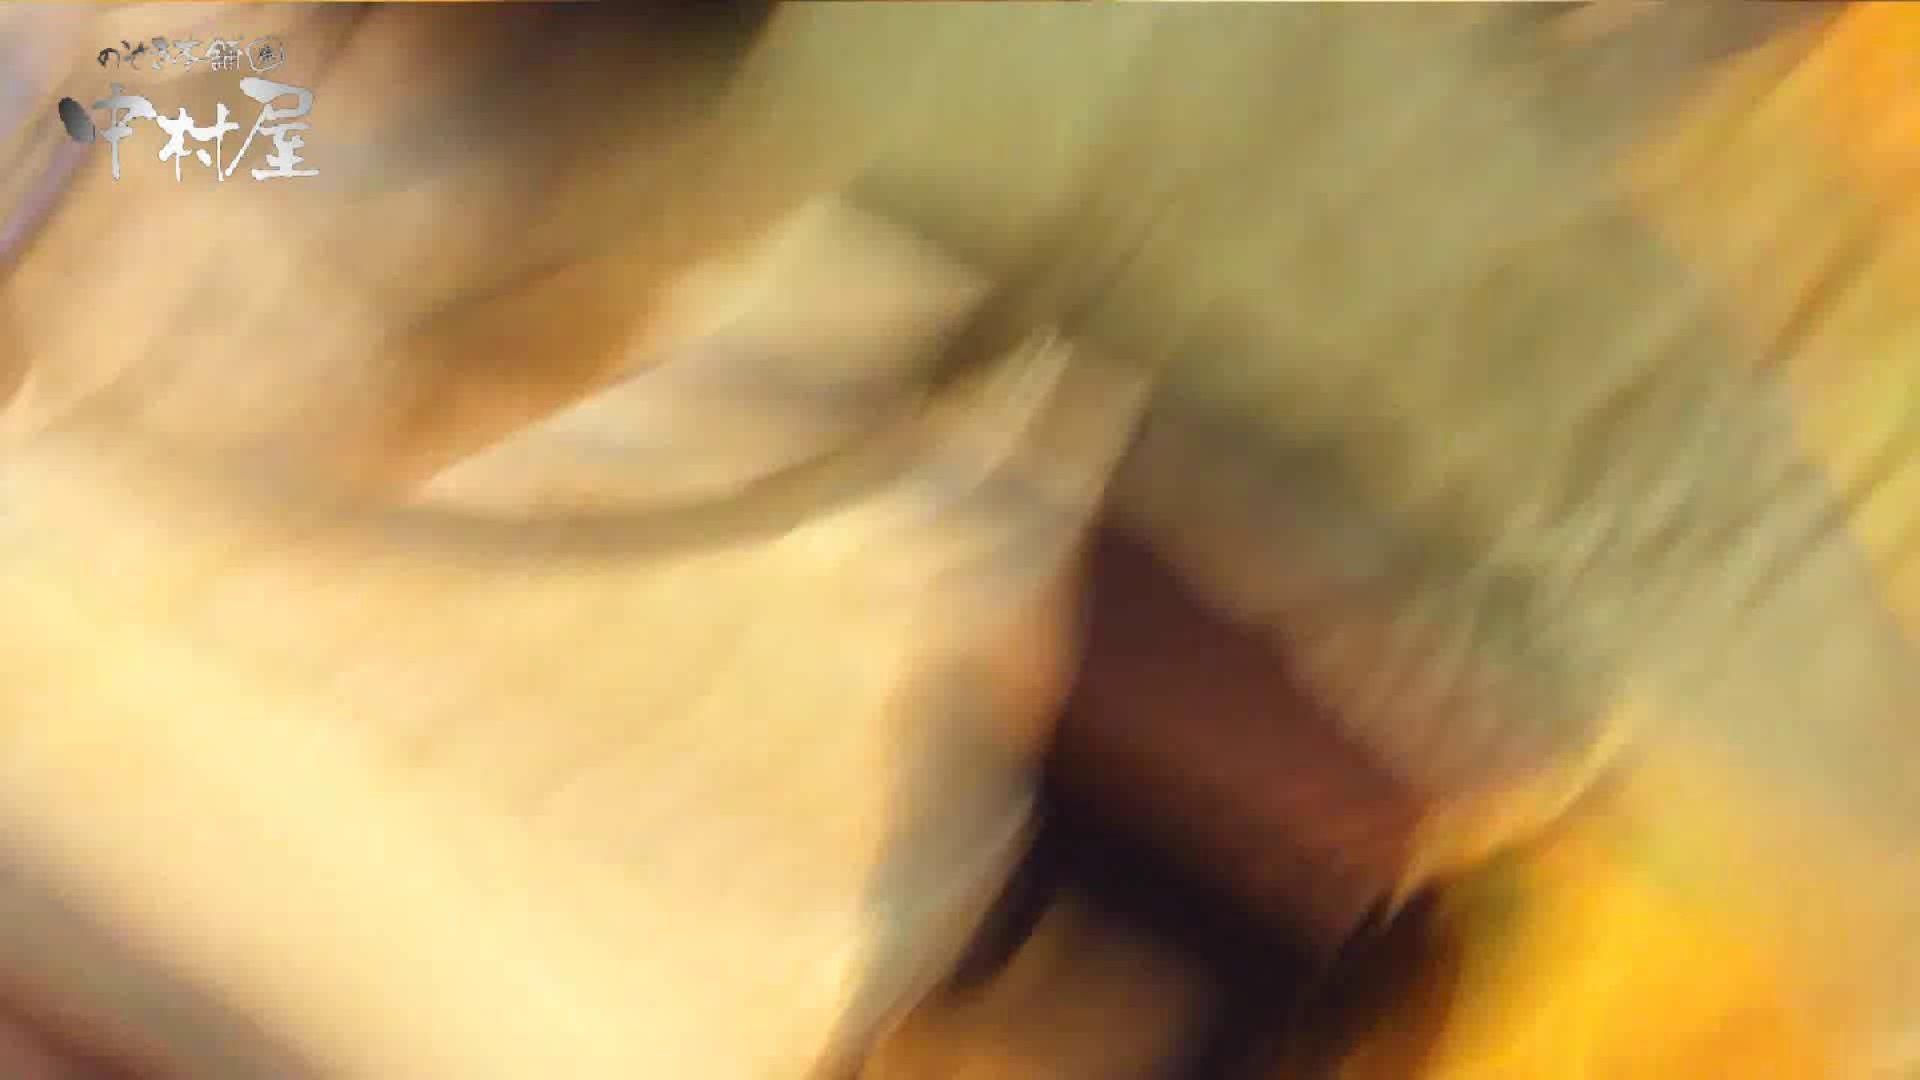 vol.45 可愛いカリスマ店員限定‼胸チラ&パンチラ 食い込みミッキーマウス! おまんこモロ出し   接写  107pic 10